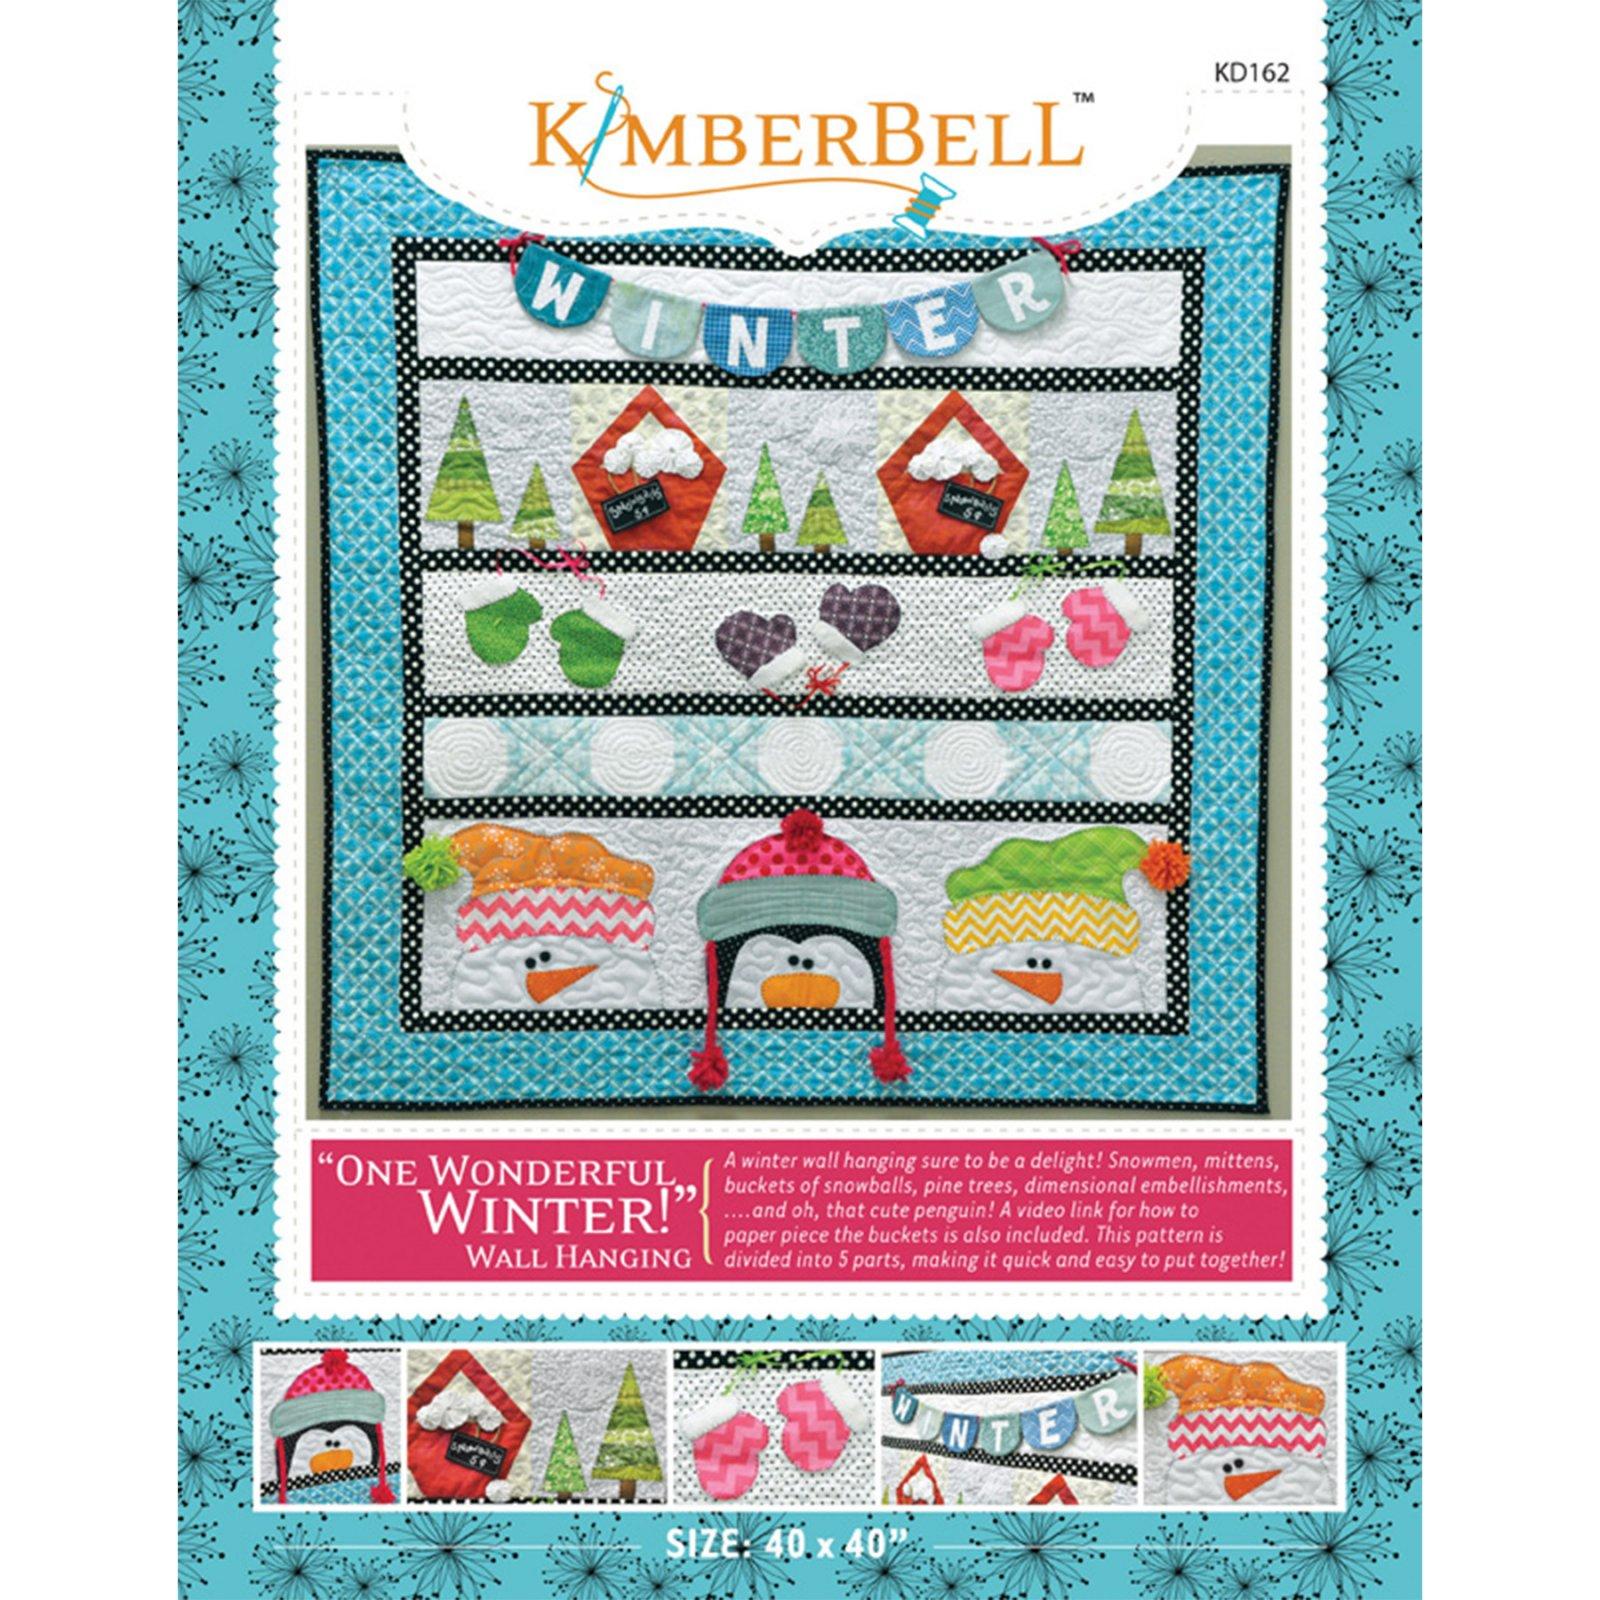 One Wonderful Winter KD162